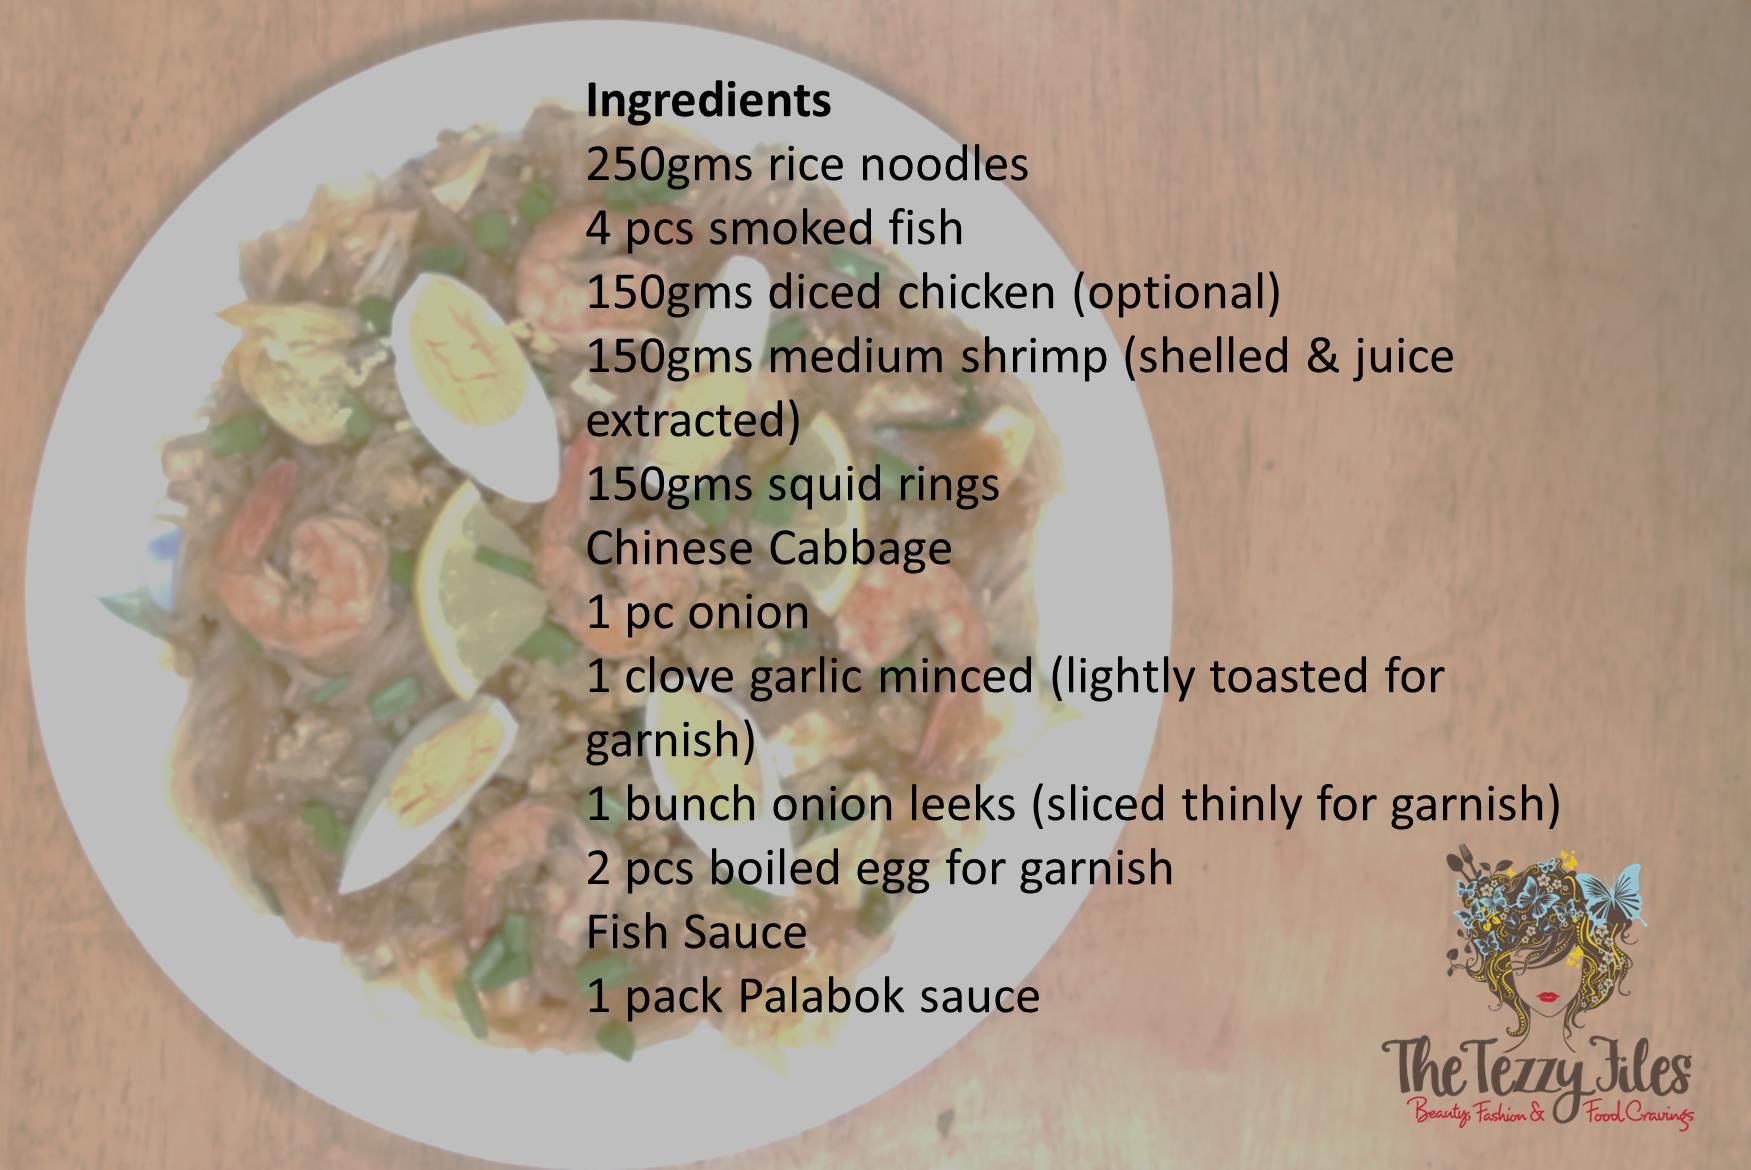 Authentic filipino cuisine and katherines recipe for pancit pancit palabok recipe ingredients forumfinder Choice Image